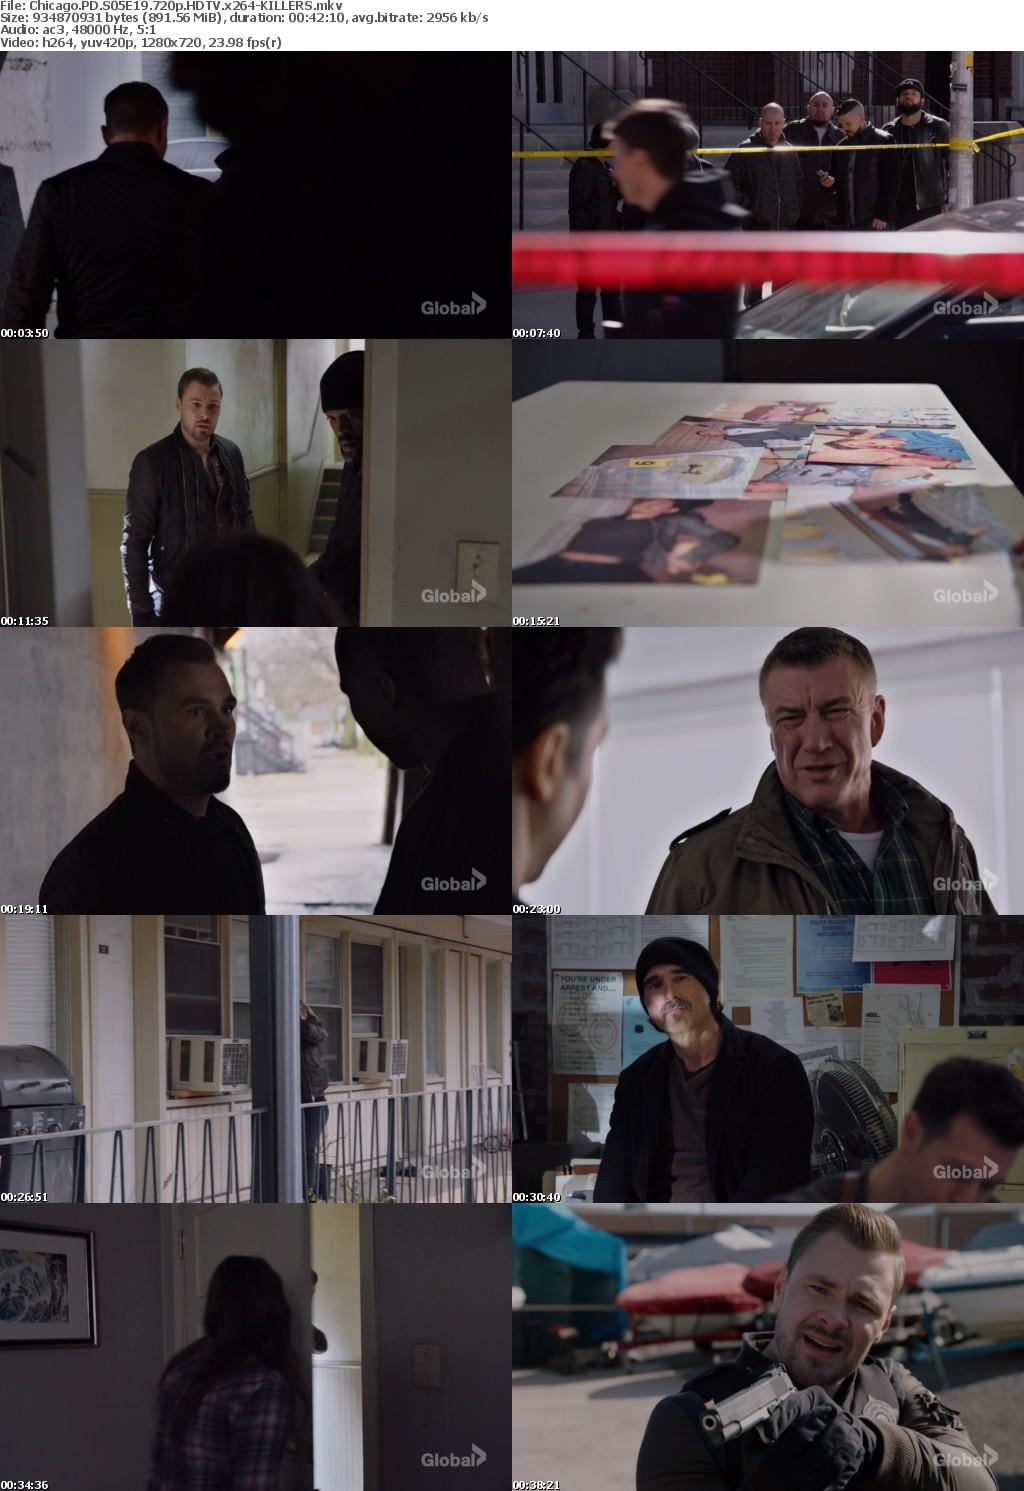 Chicago PD S05E19 720p HDTV x264-KILLERS